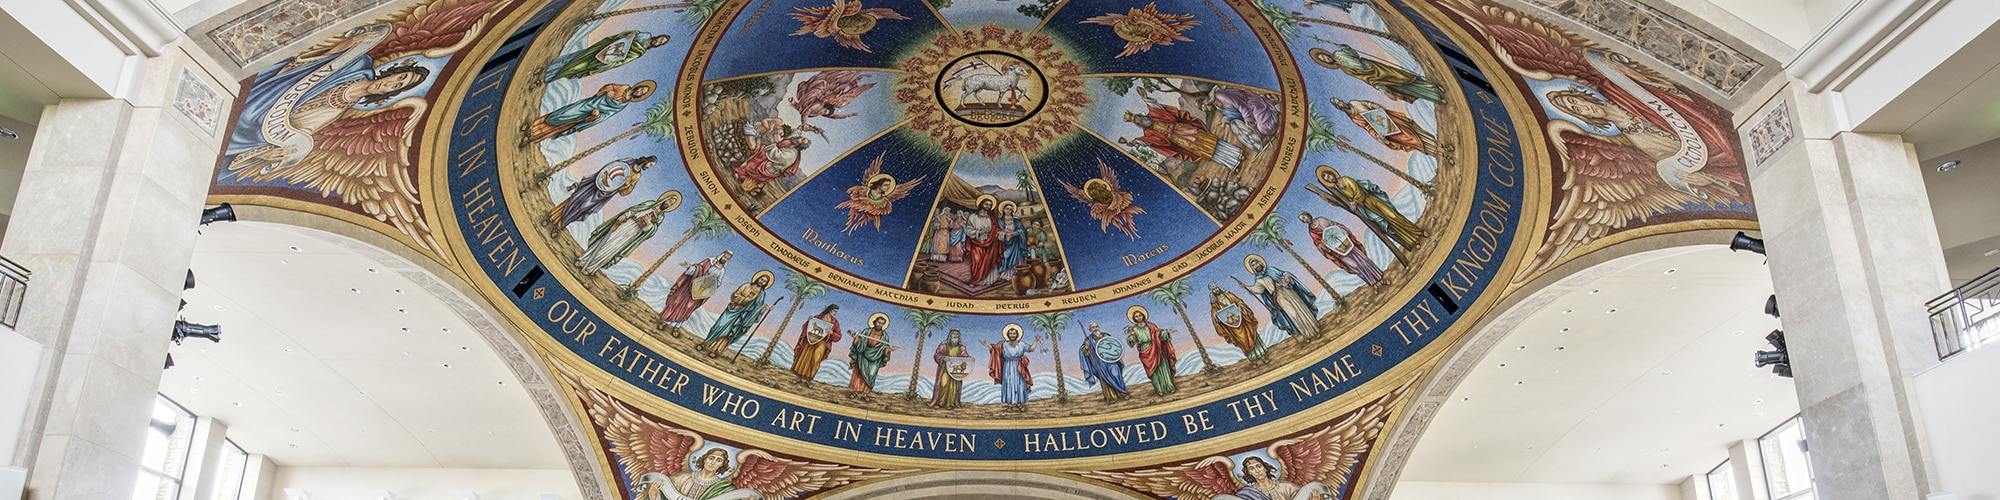 St. John Neumann Catholic Church | Sanctuary - AQUILA Project Management Case Study